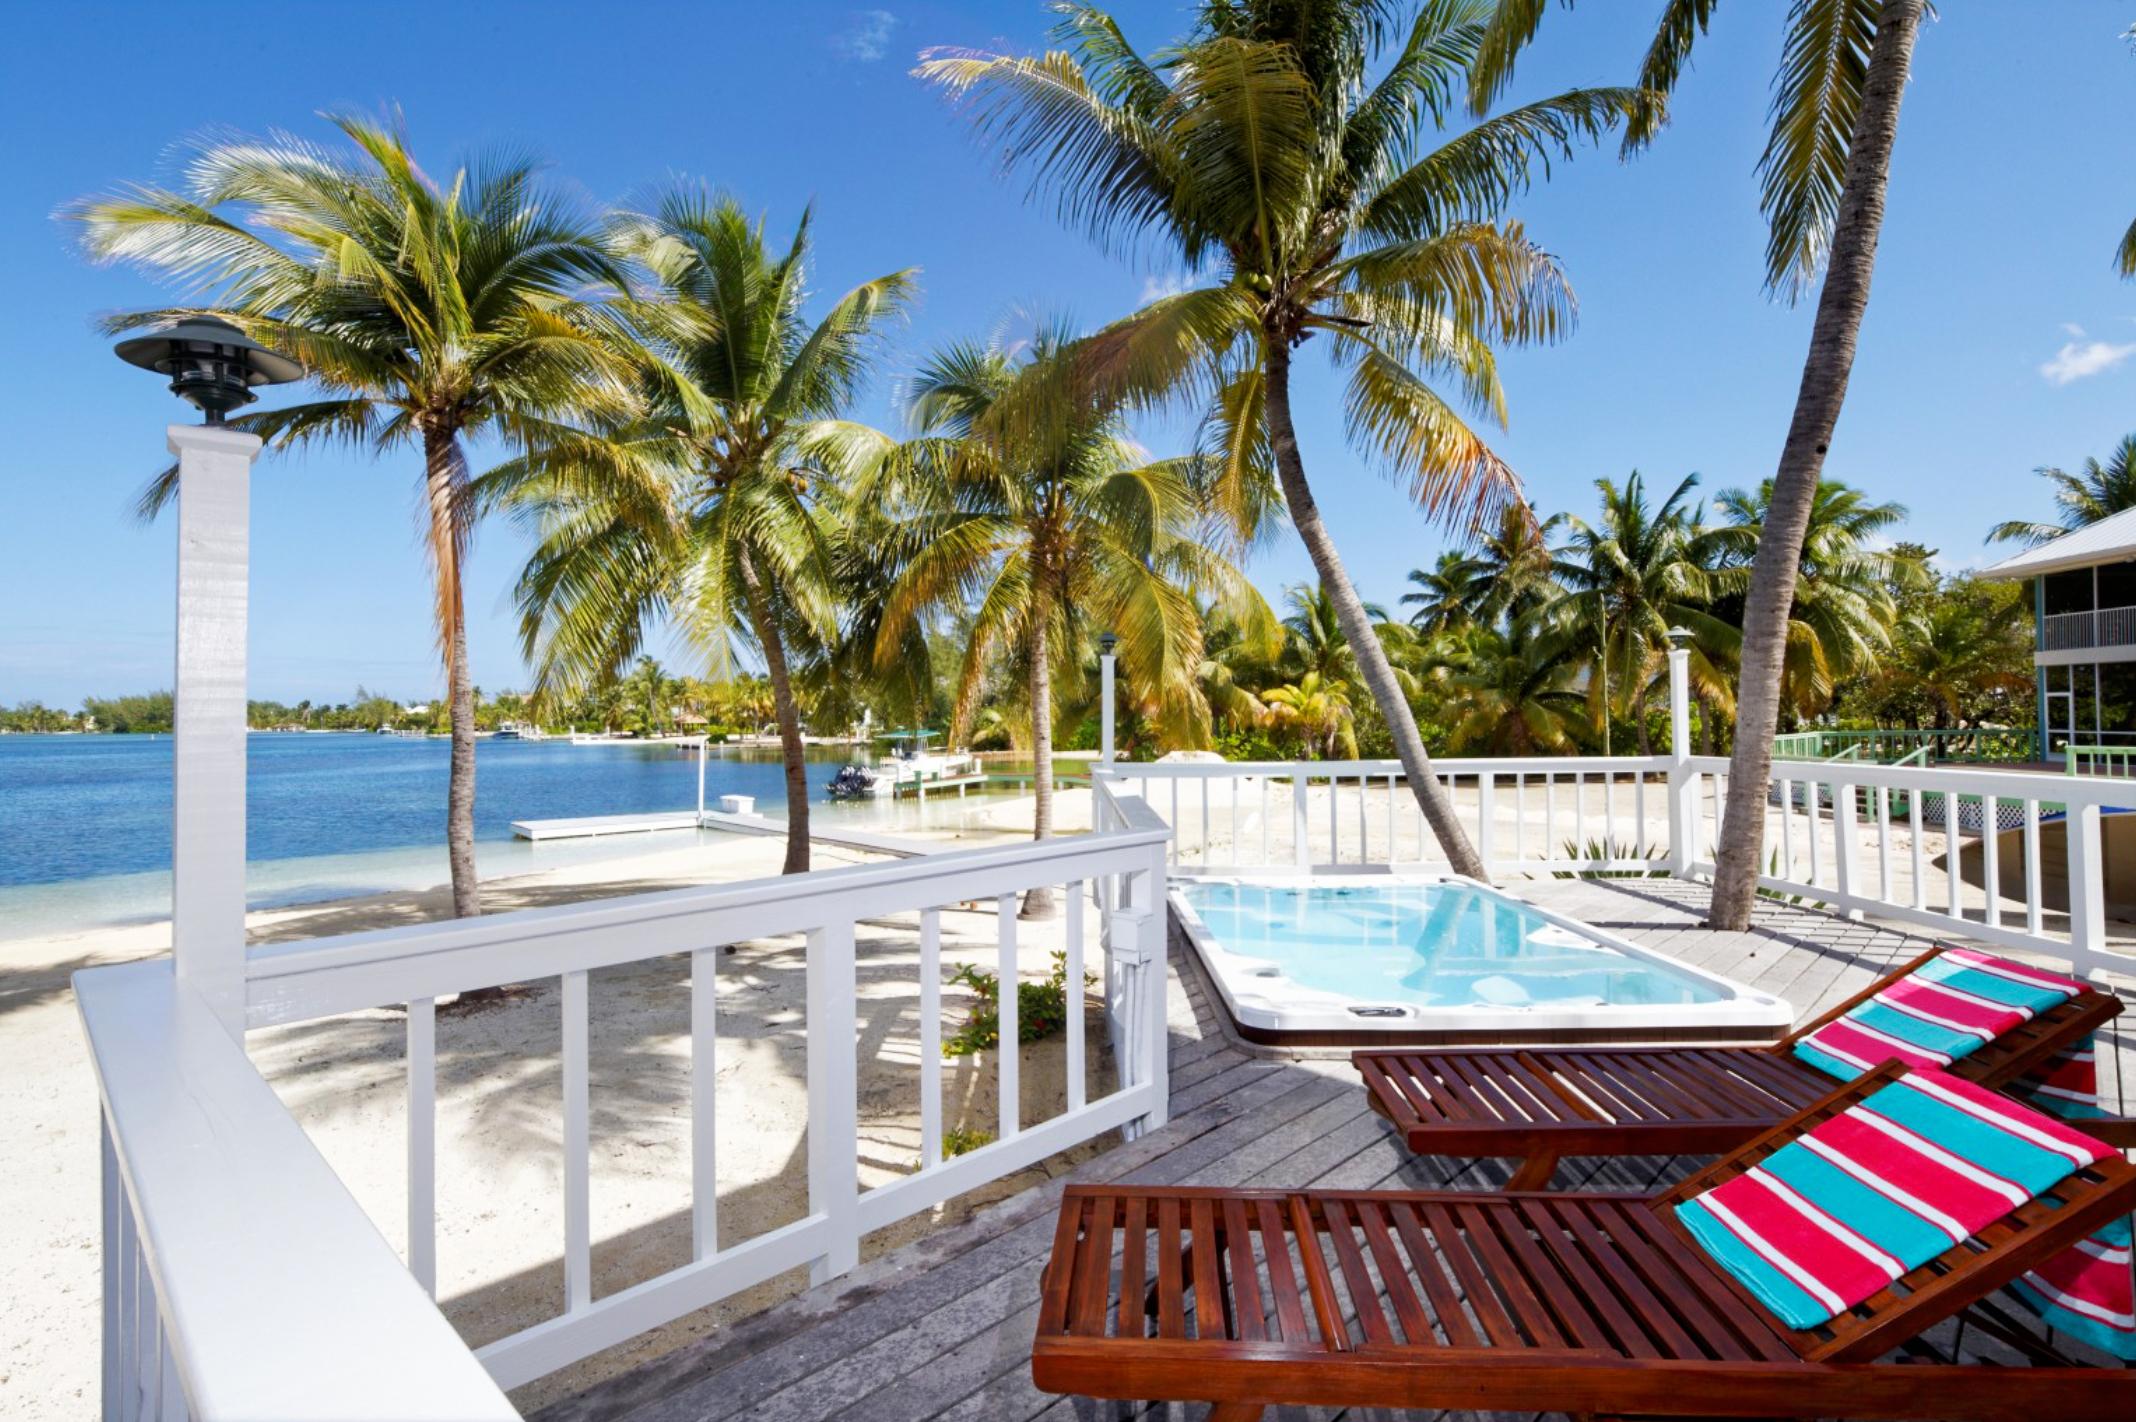 Villa CM SMC, 2br, Cayman Kai